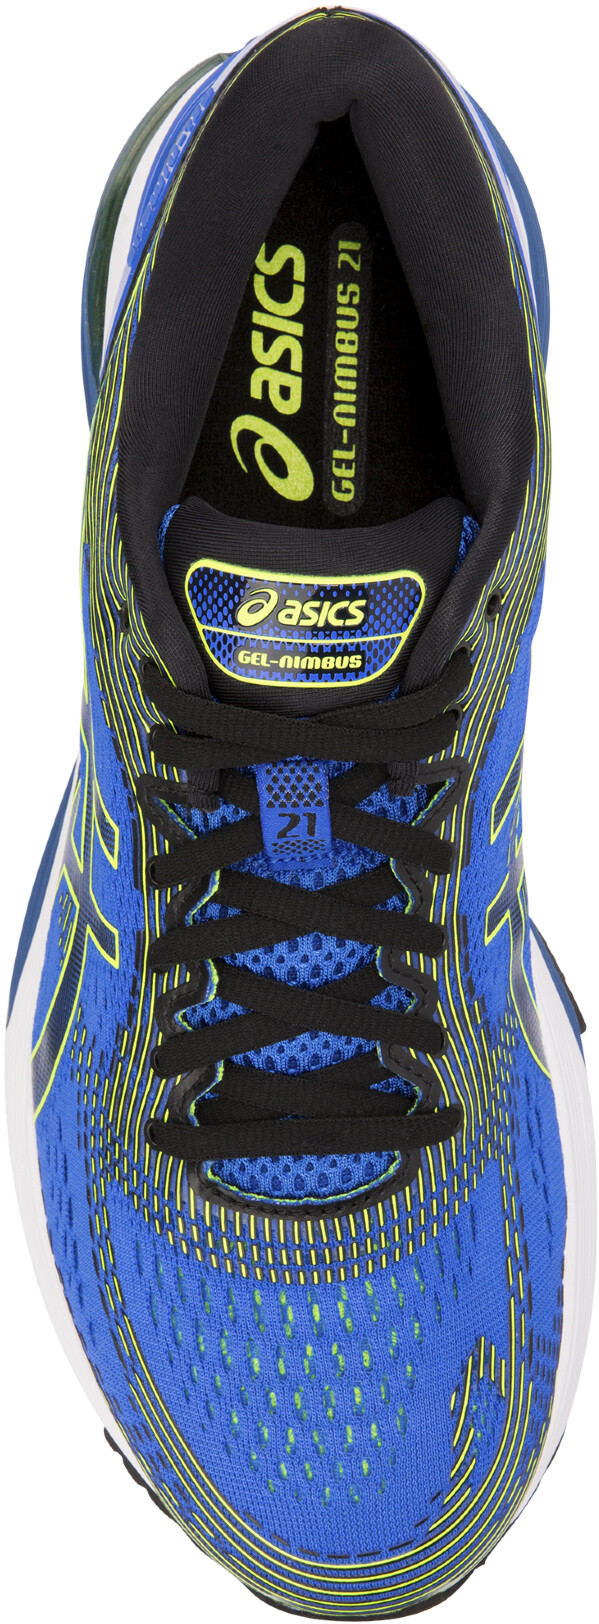 asics Gel-Nimbus 21 scarpe da corsa Uomo blu nero su Bikester 2120cc7b89c